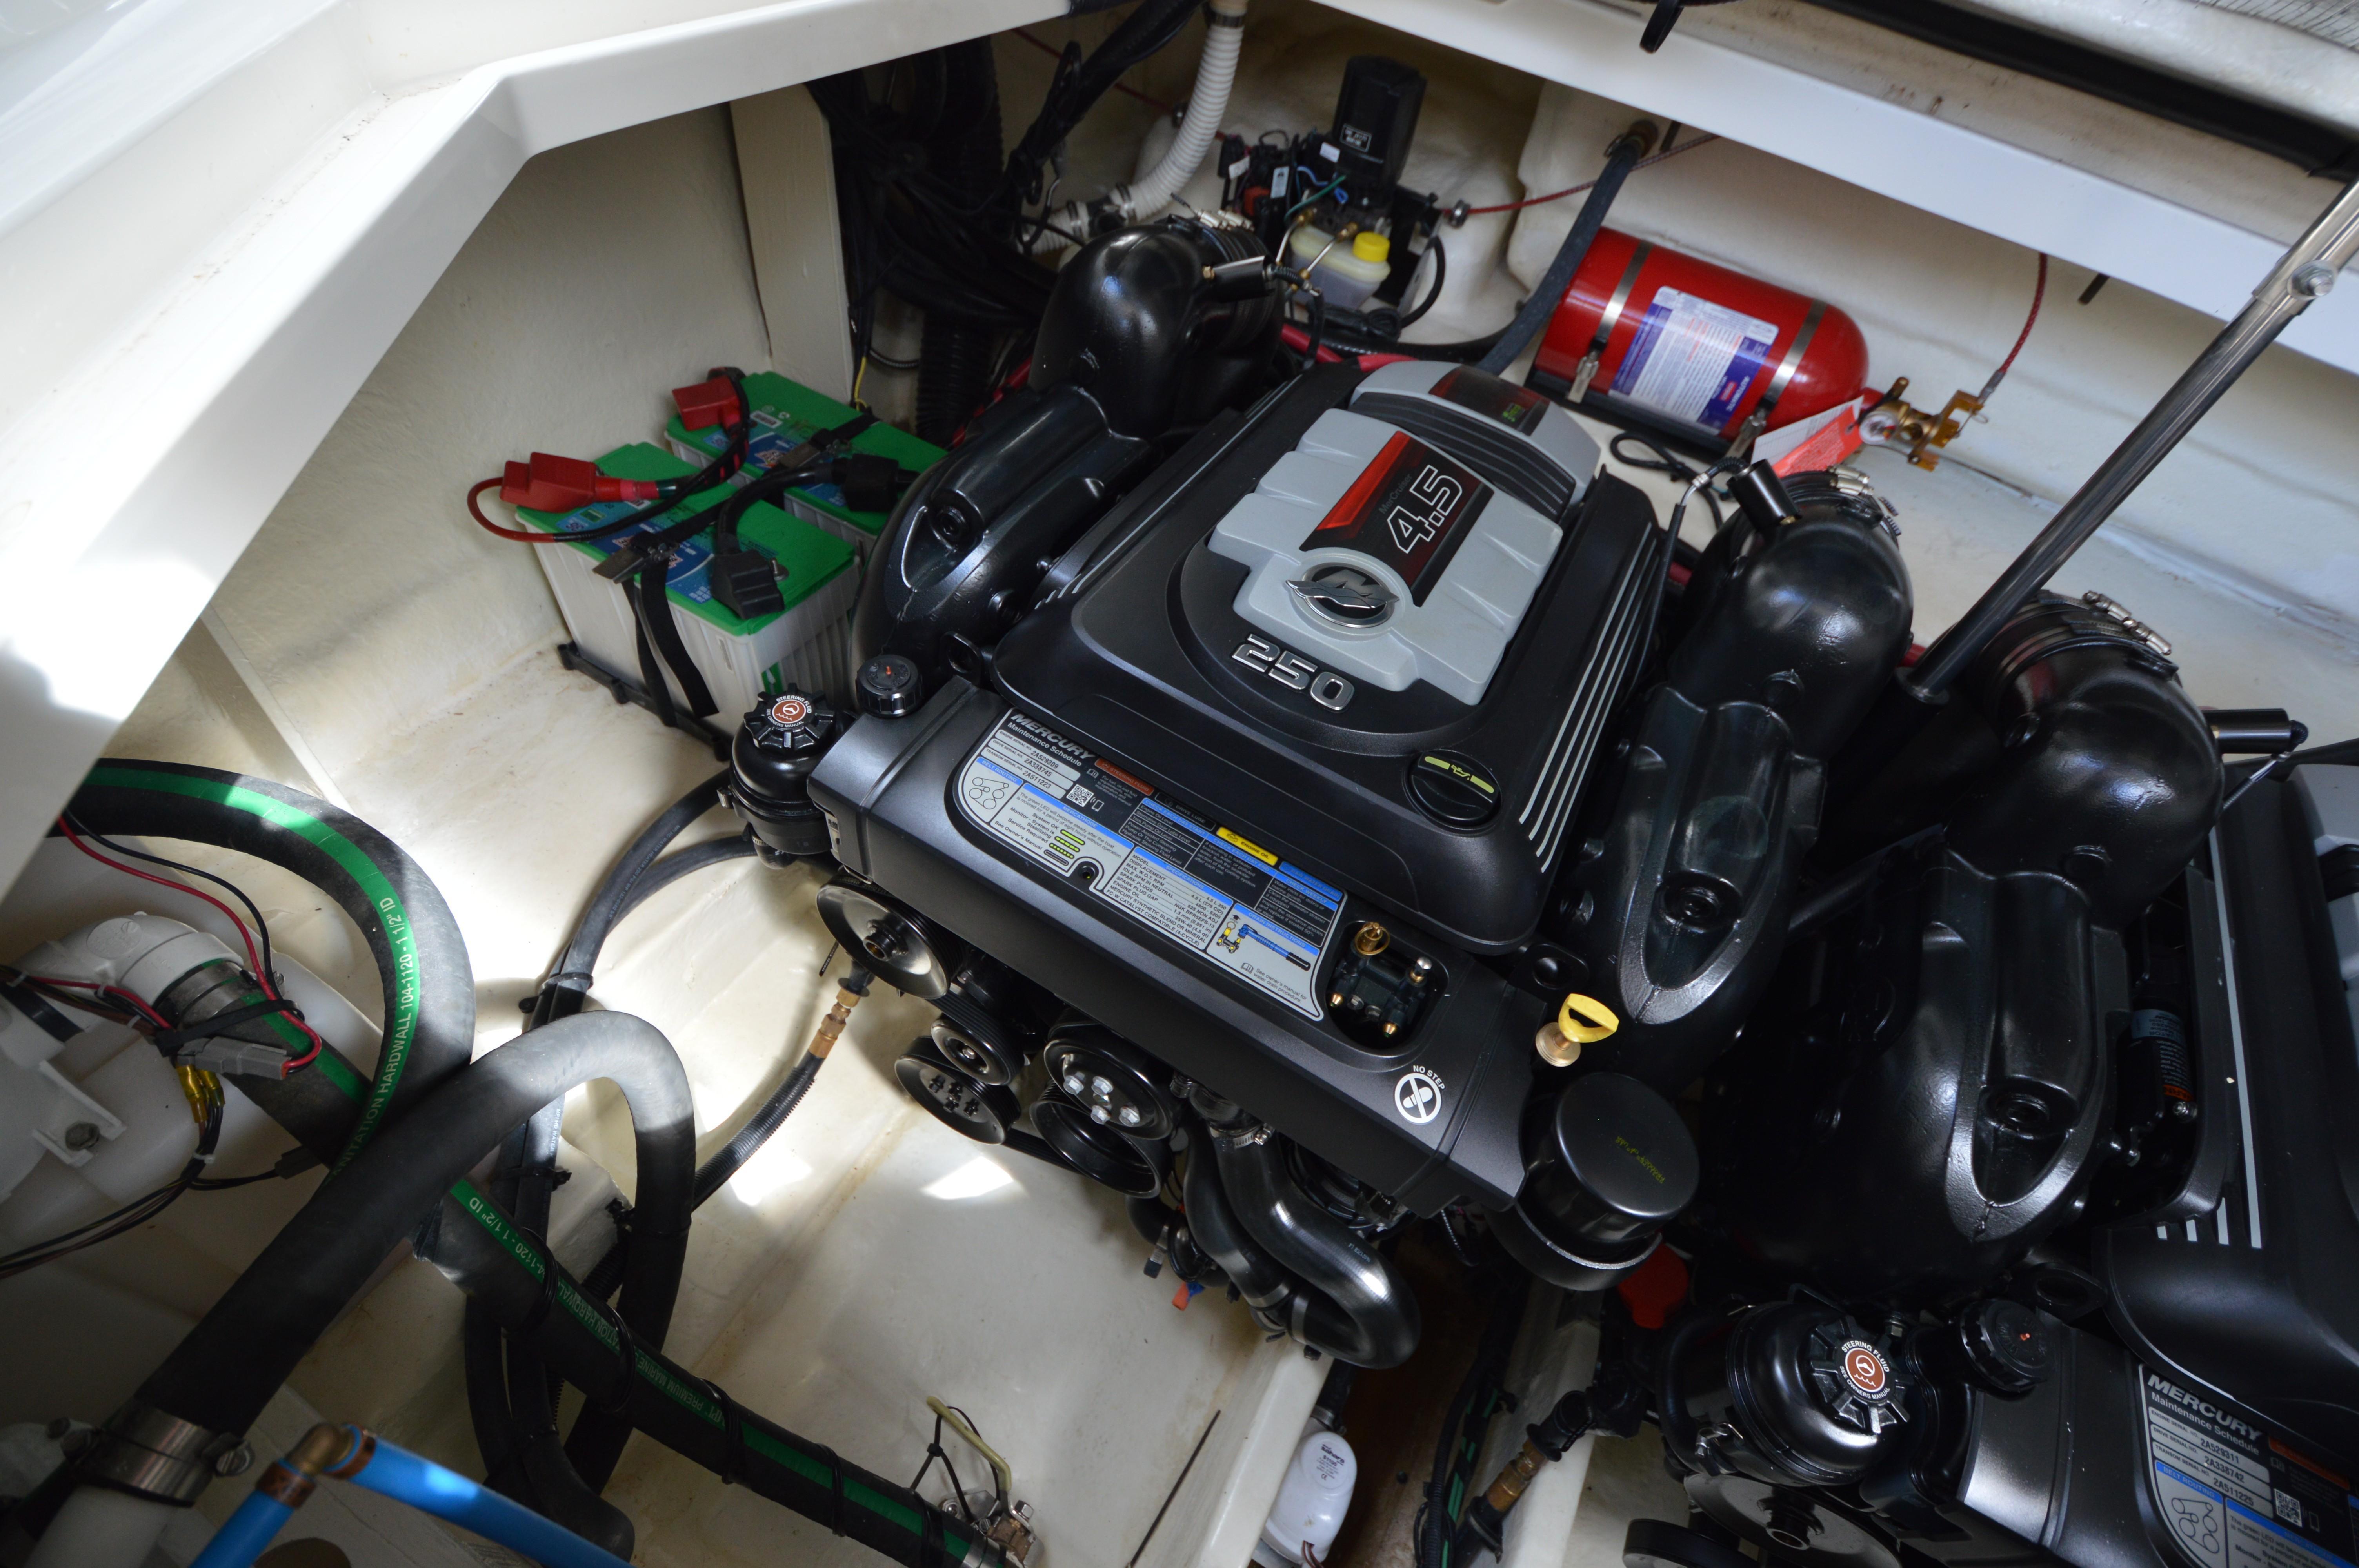 2017 Sea Ray 31 Sports Cruiser Hmy Yacht Sales Mercury Smartcraft Speedometer Gps Wiring 310 Sundancer